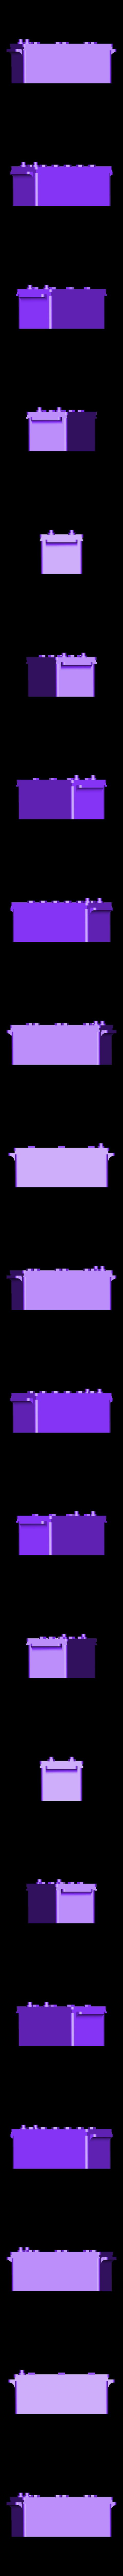 Batterie PL.STL Download STL file Battery for rc trucks • 3D print object, ConceptRCTruck